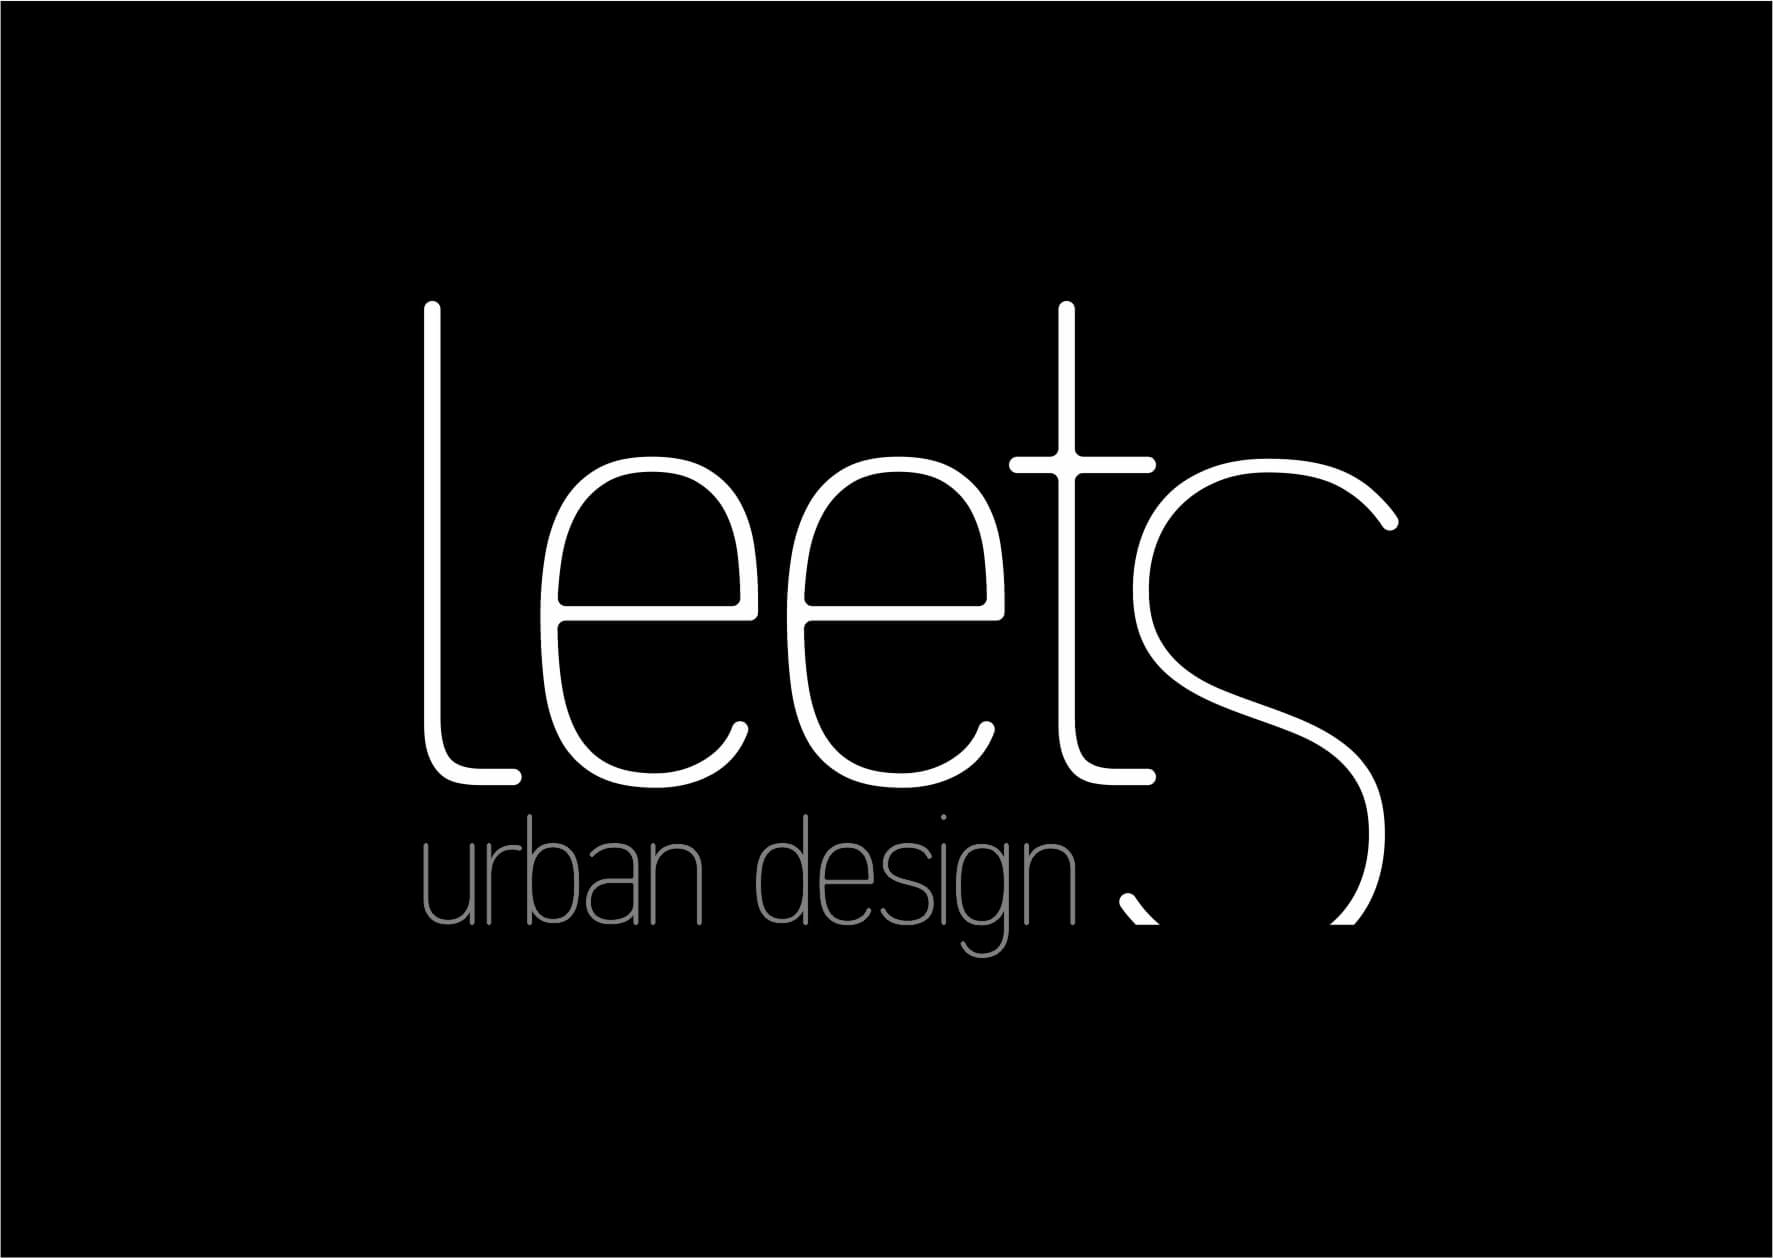 LEETS urban design